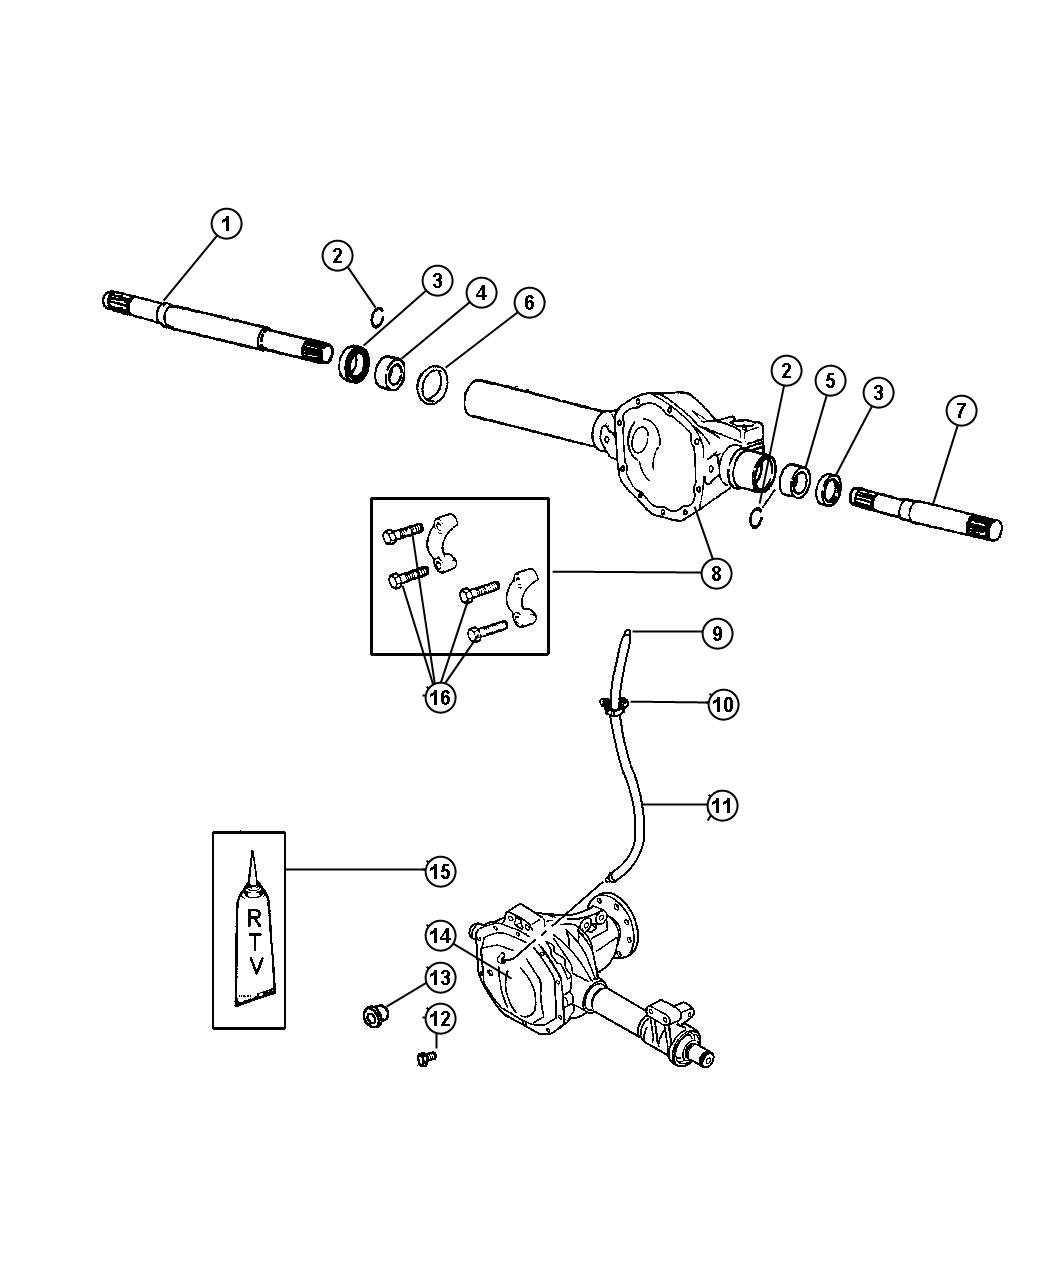 2001 dodge dakota 4.7 wiring harness